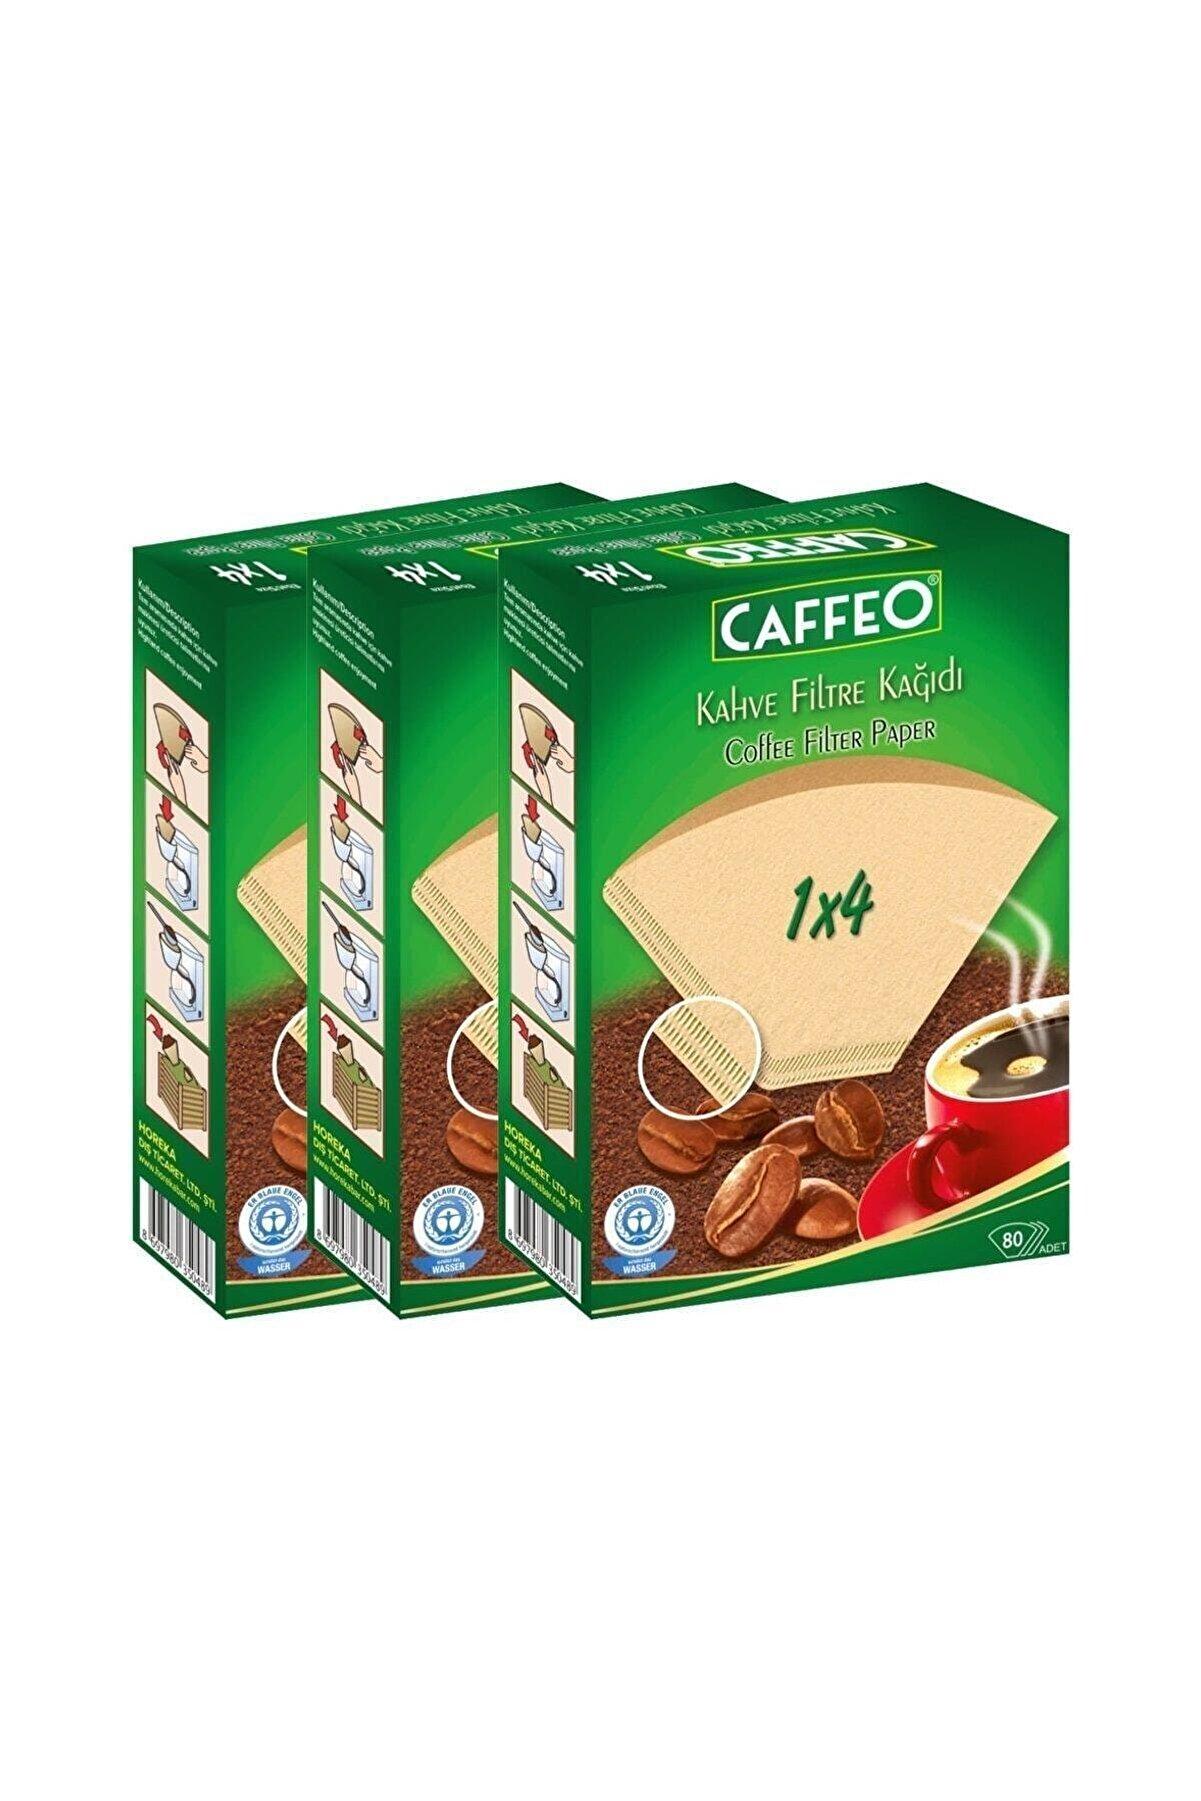 Caffeo Kahve Filtre Kağıdı 1x4 80 Adet 3 Lü Set 240 Adet